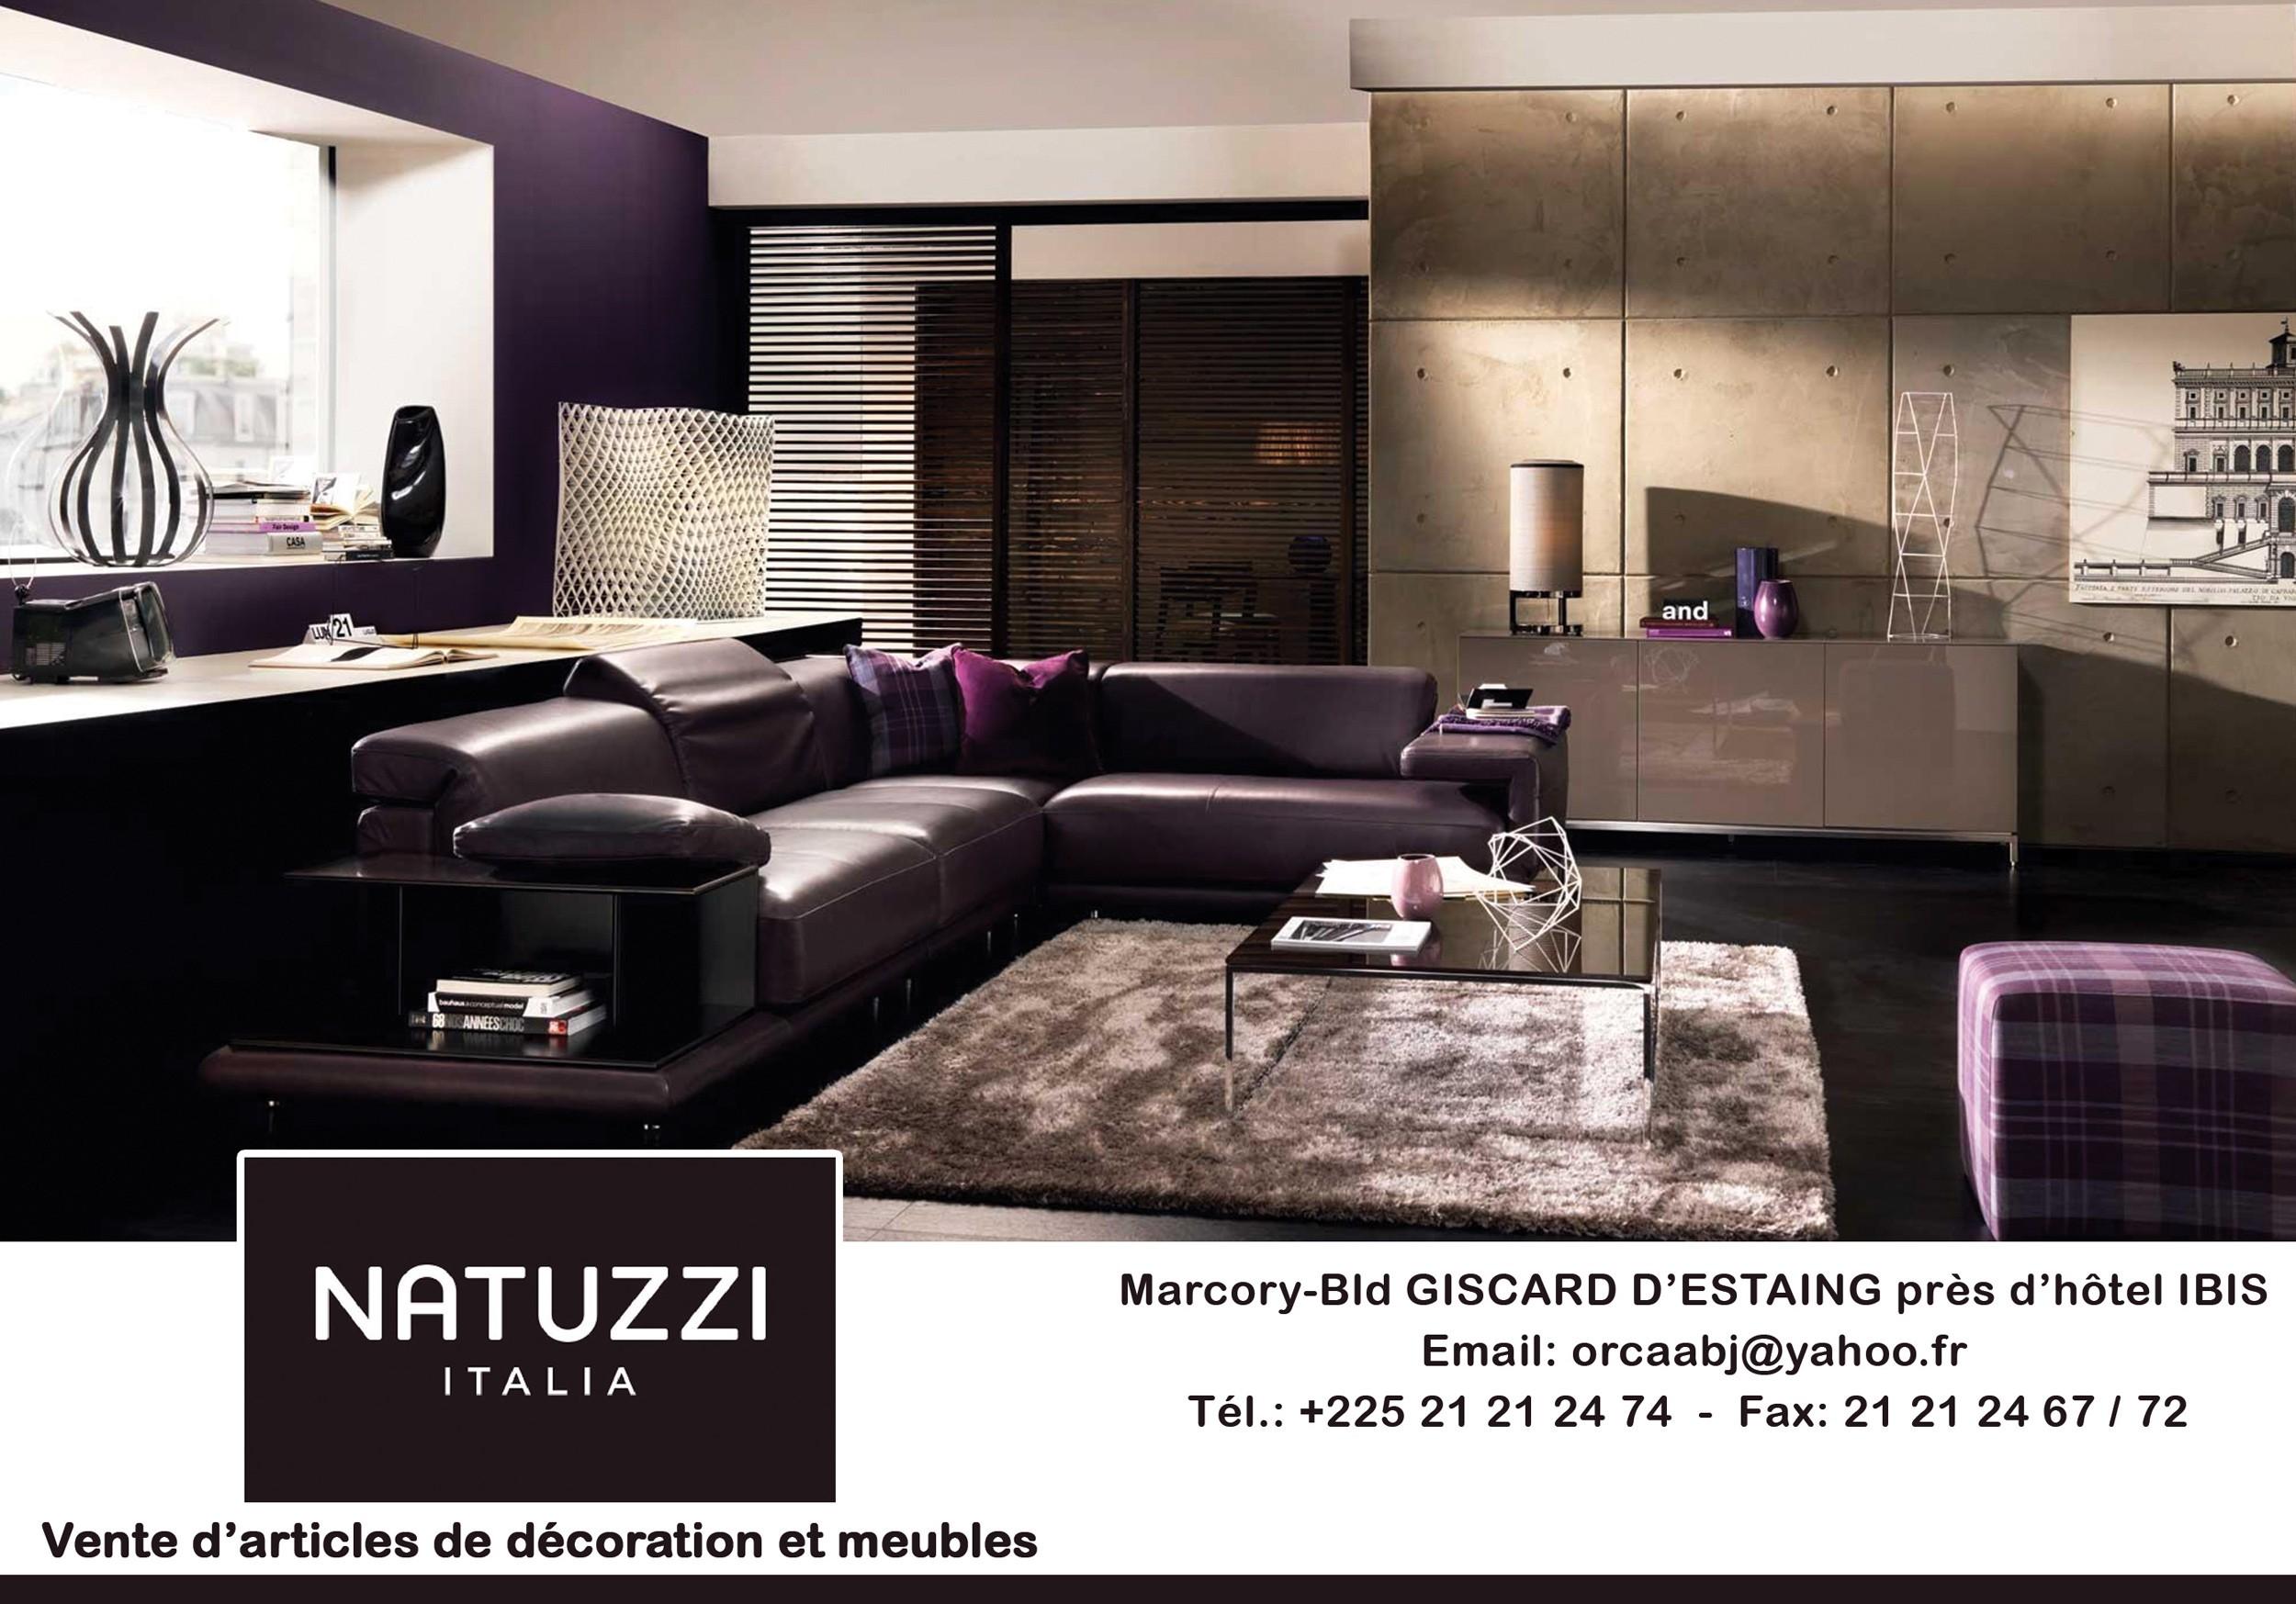 Natuzzi mobilier de bureau